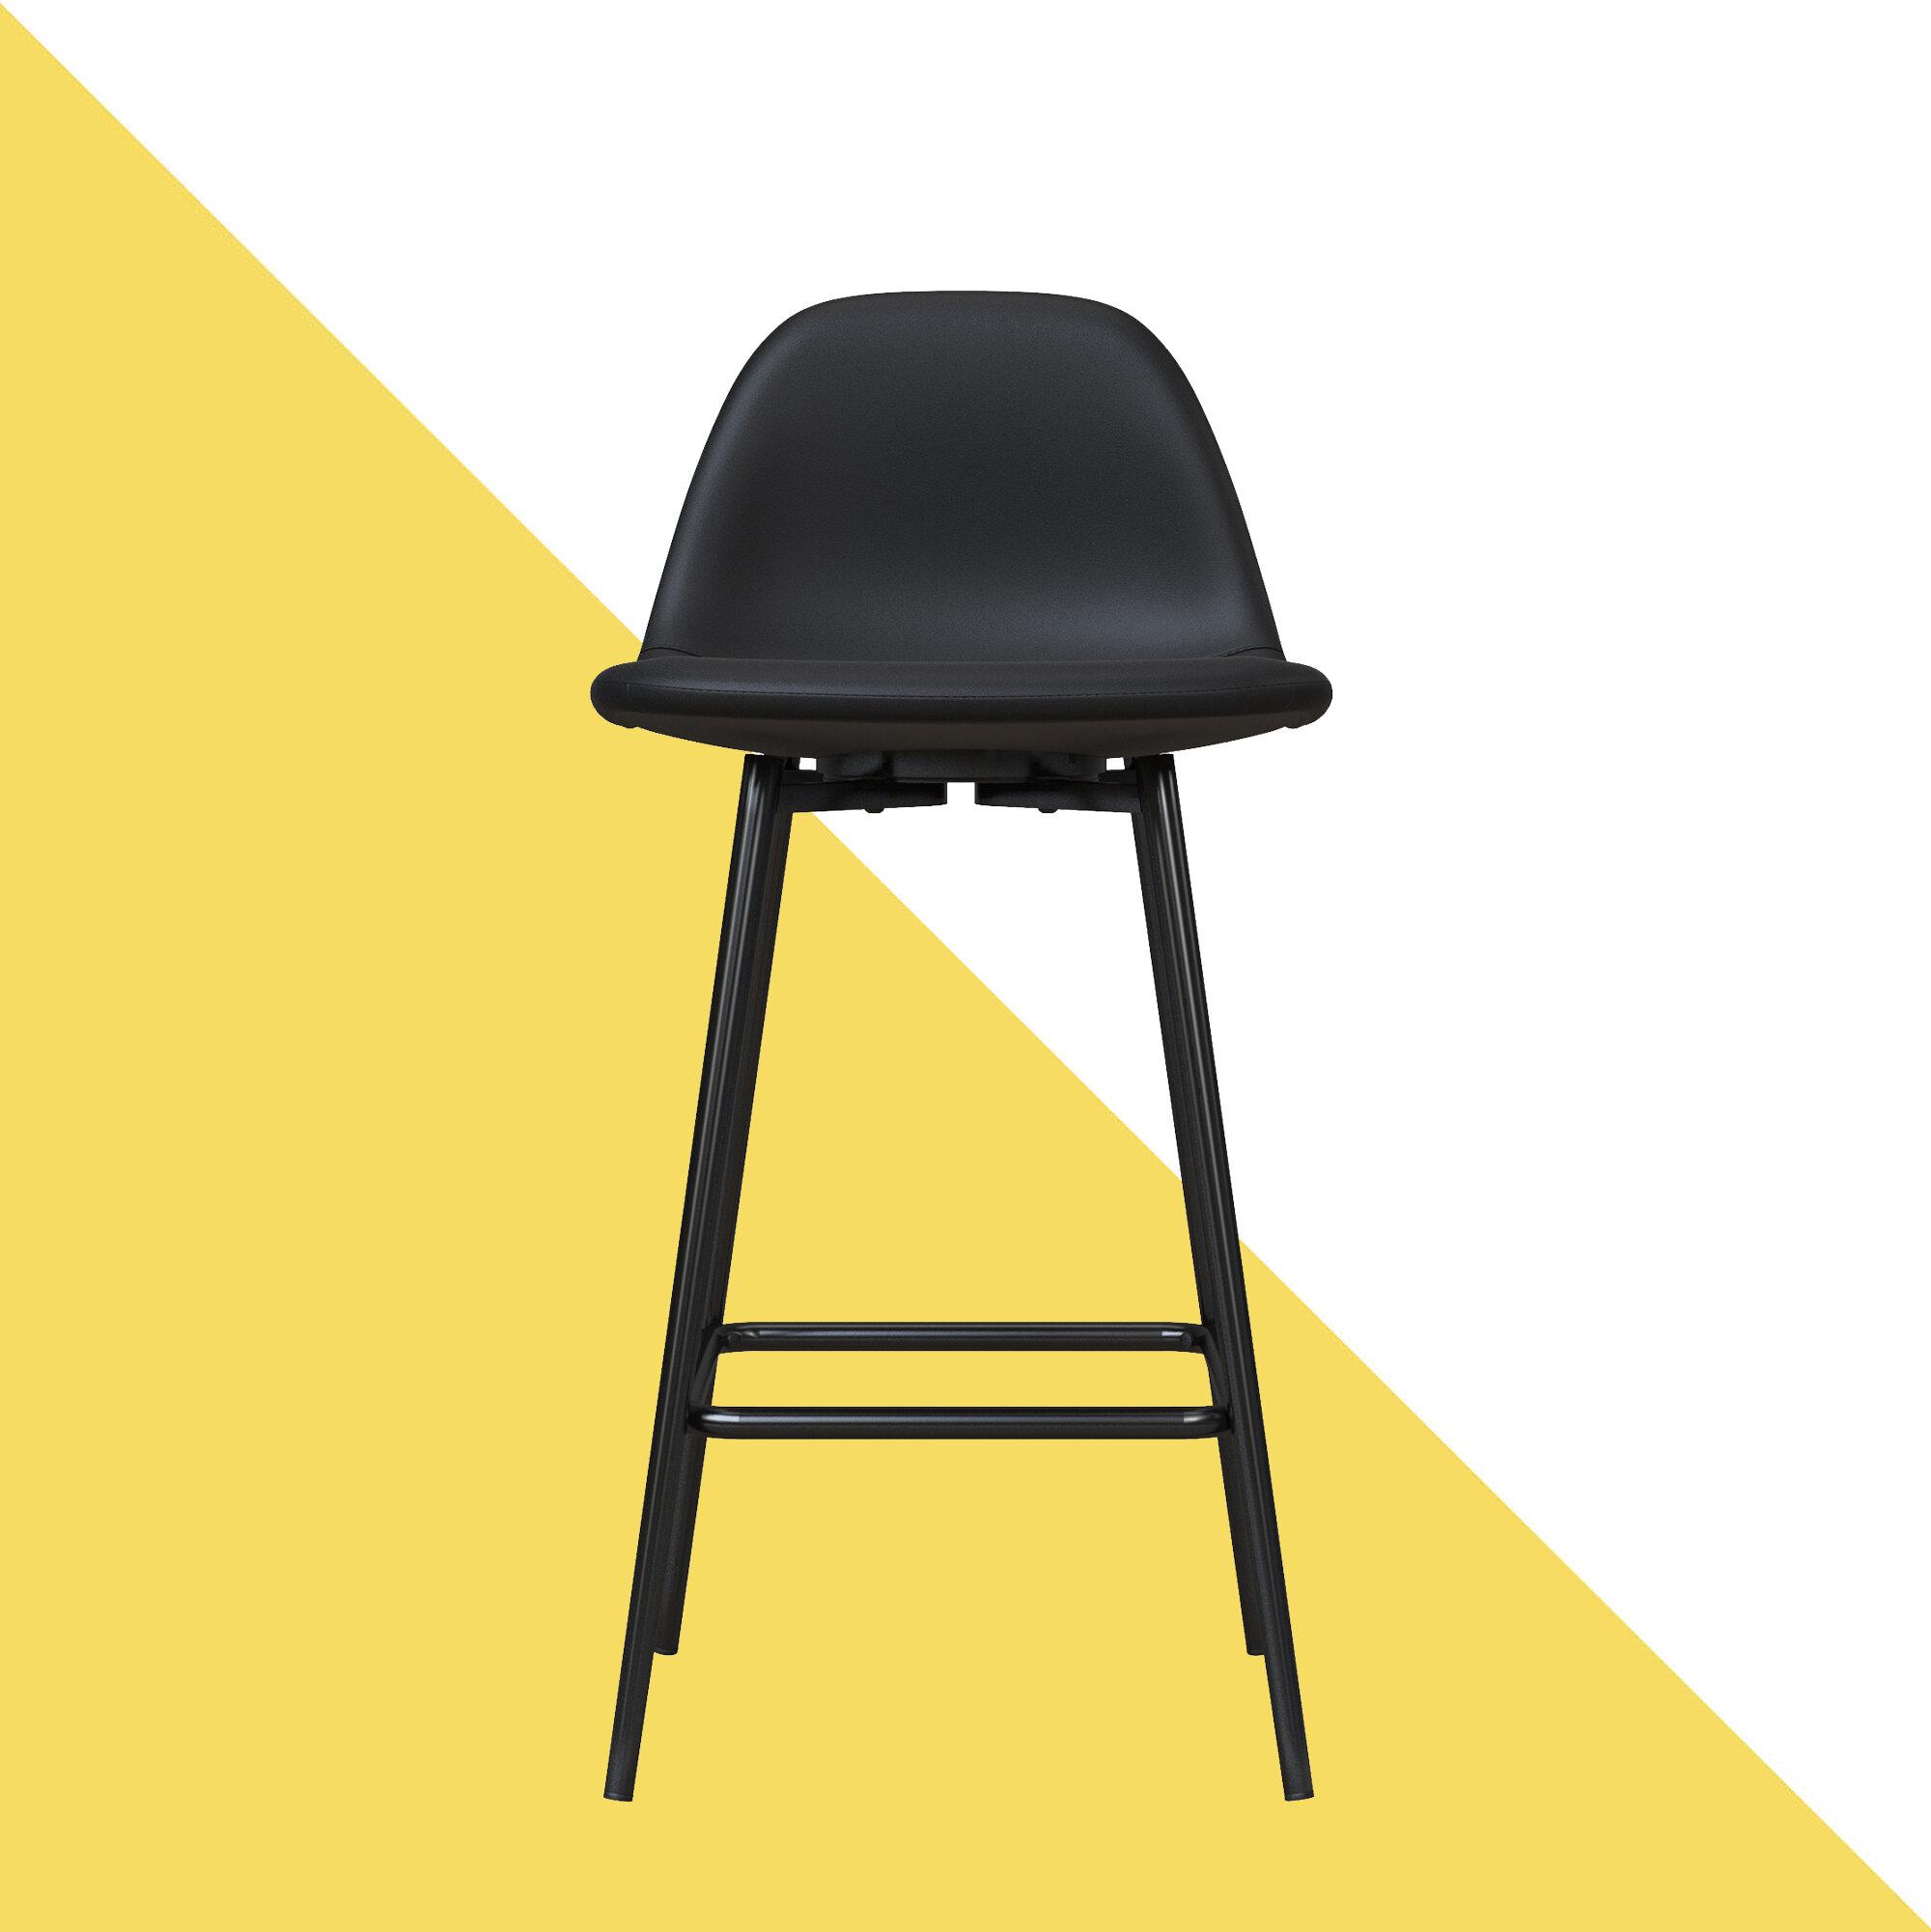 Stupendous Bowen Counter Extra Tall Stool Creativecarmelina Interior Chair Design Creativecarmelinacom